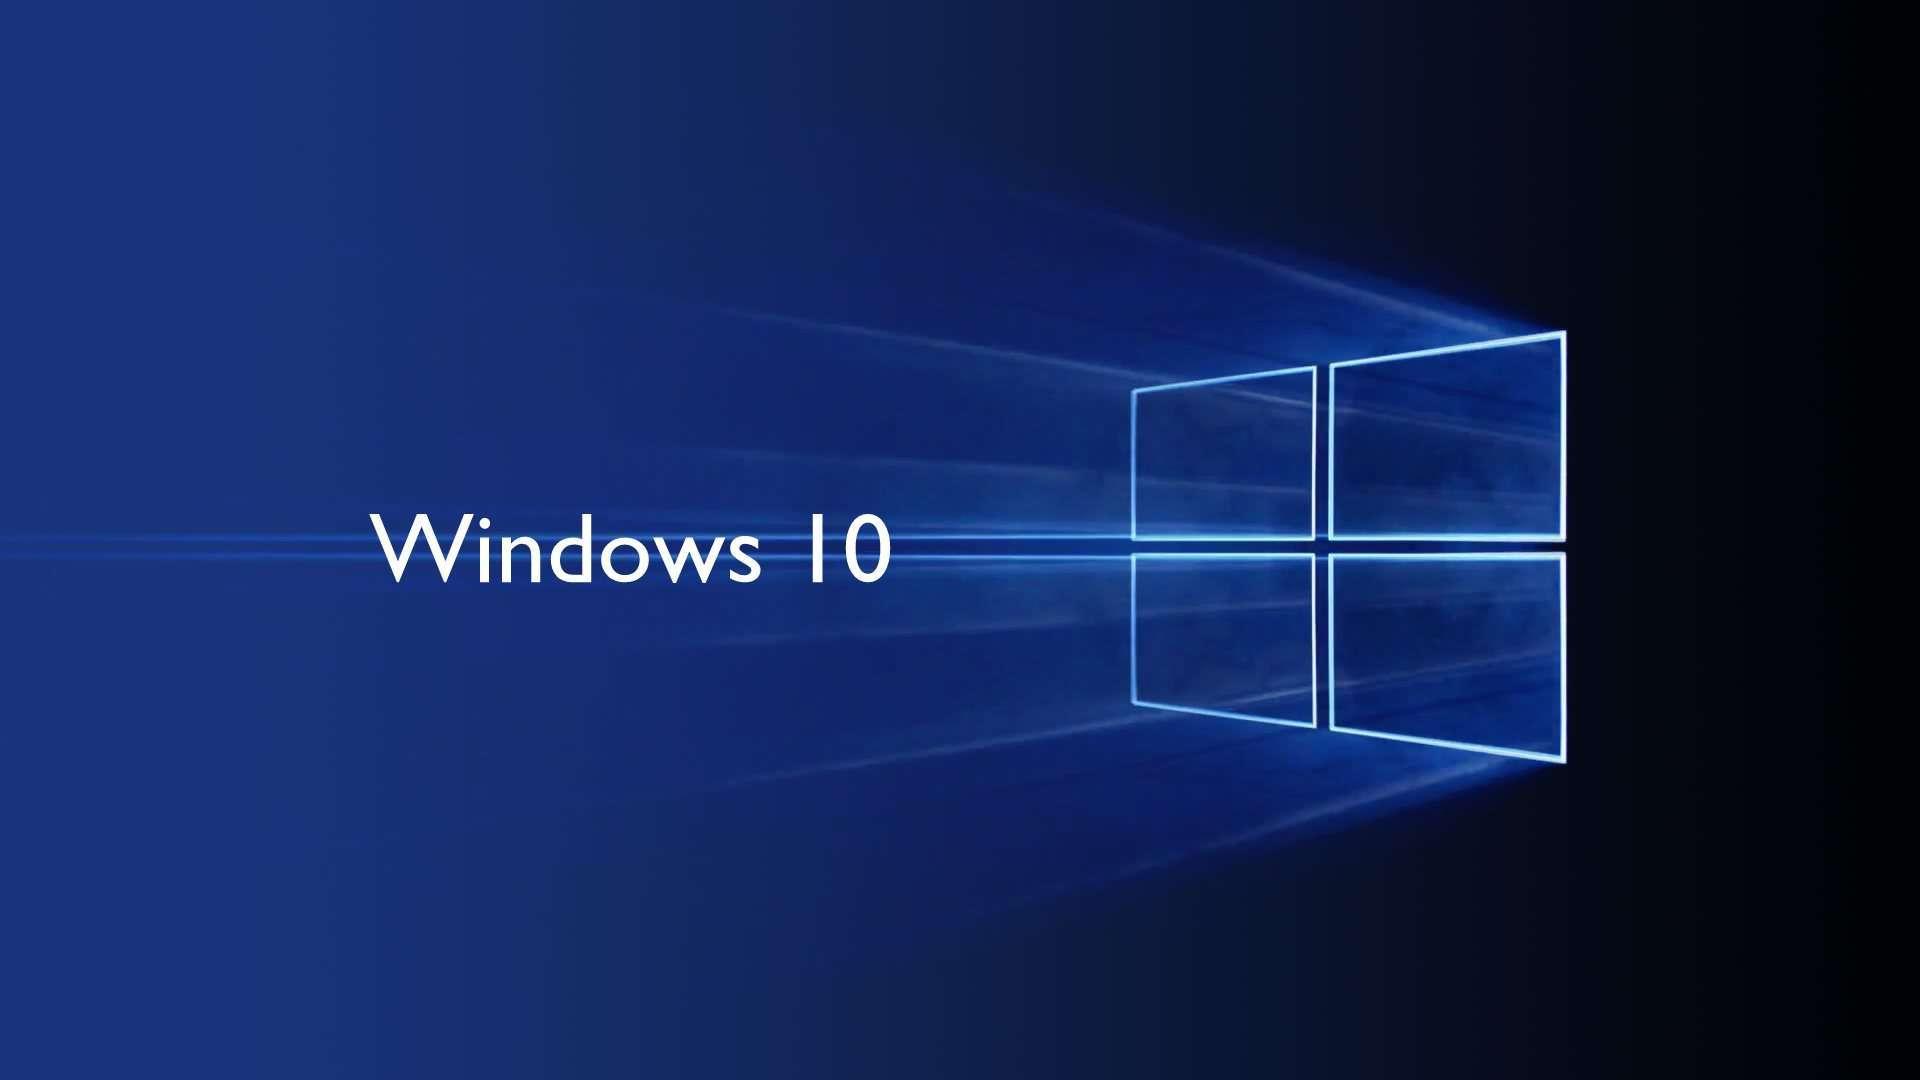 Wallpaper For Pc Windows 10